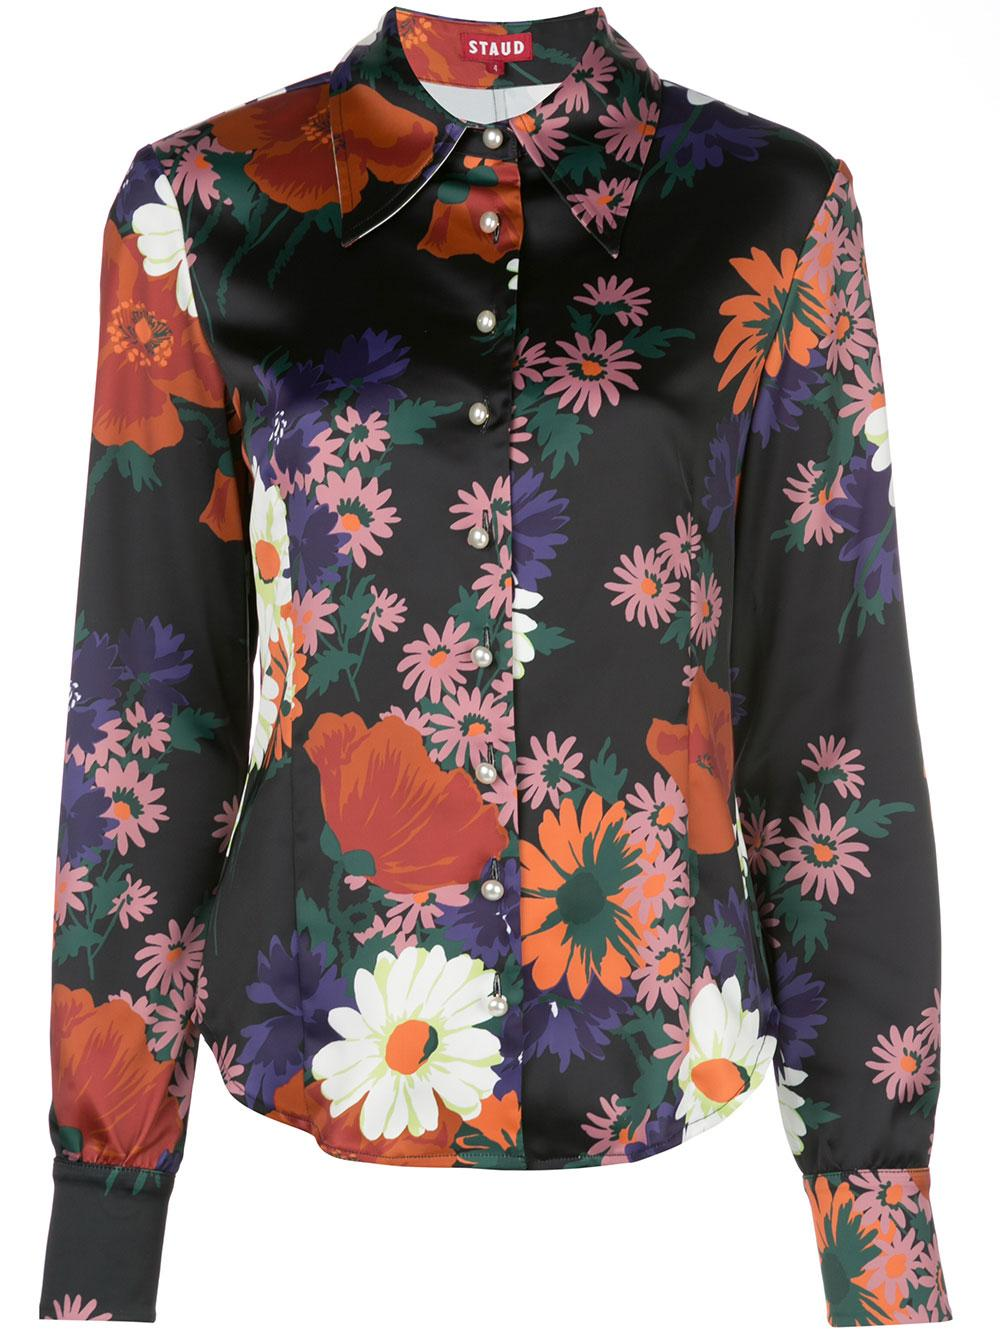 Hendrix Floral Top